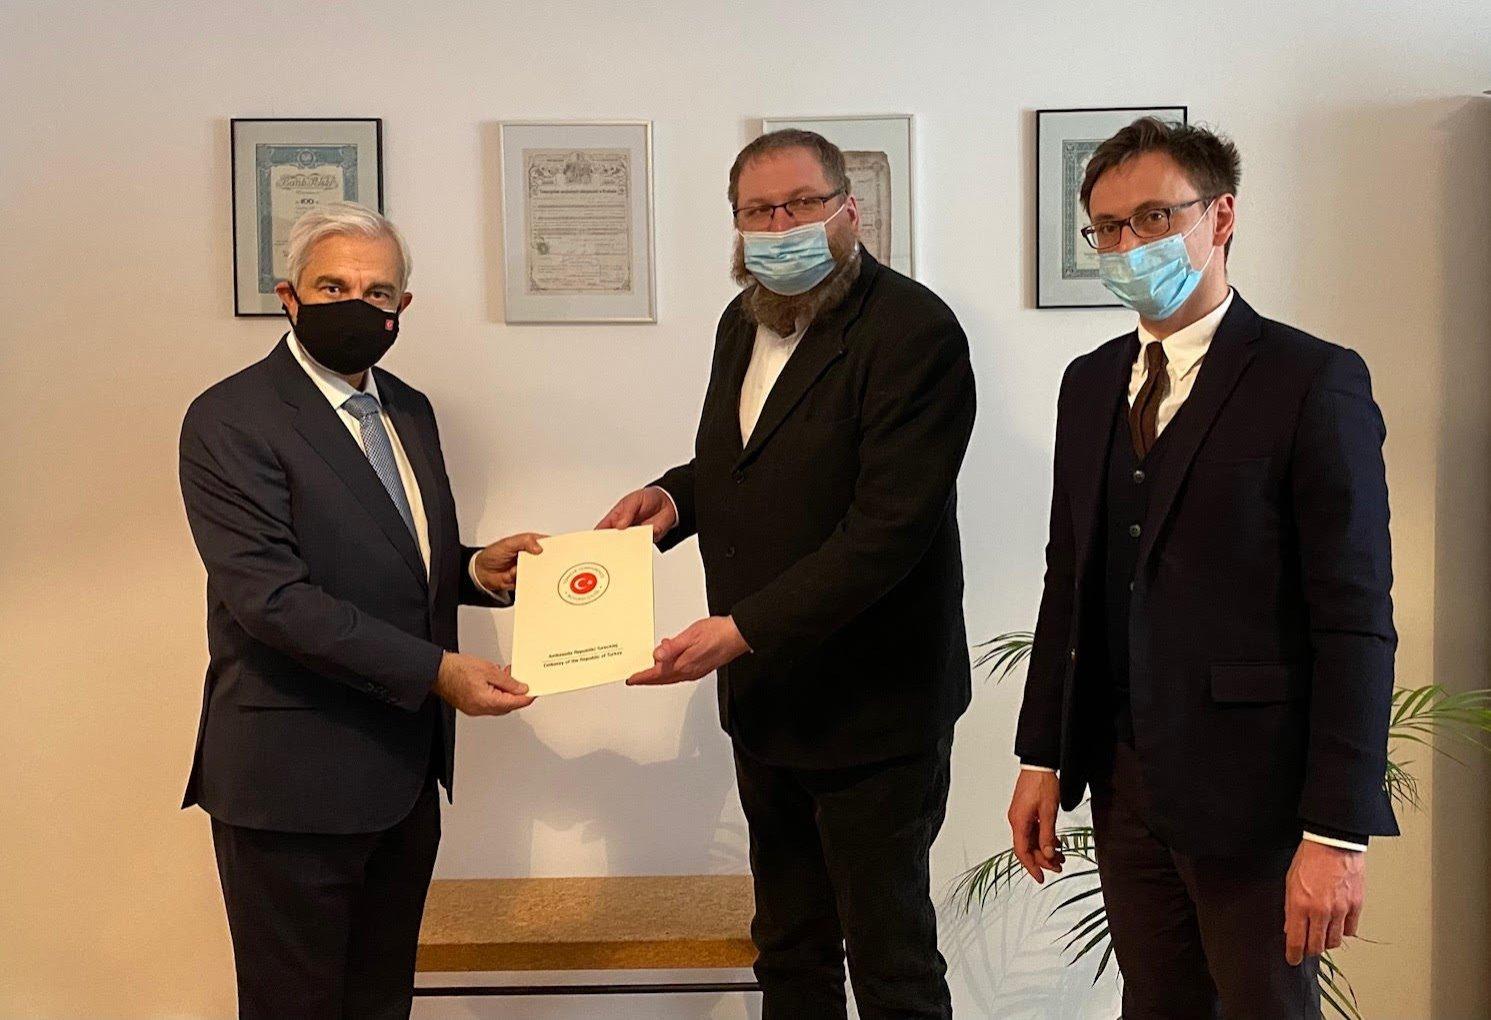 Tunç Üğdül, the Turkish ambassador to Poland, presents a 30,000 euro ($36,000) contribution to Piotr Cywinski, the director of the Auschwitz-Birkenau State Museum, Warsaw, Poland, March 18, 2021. (IHA)